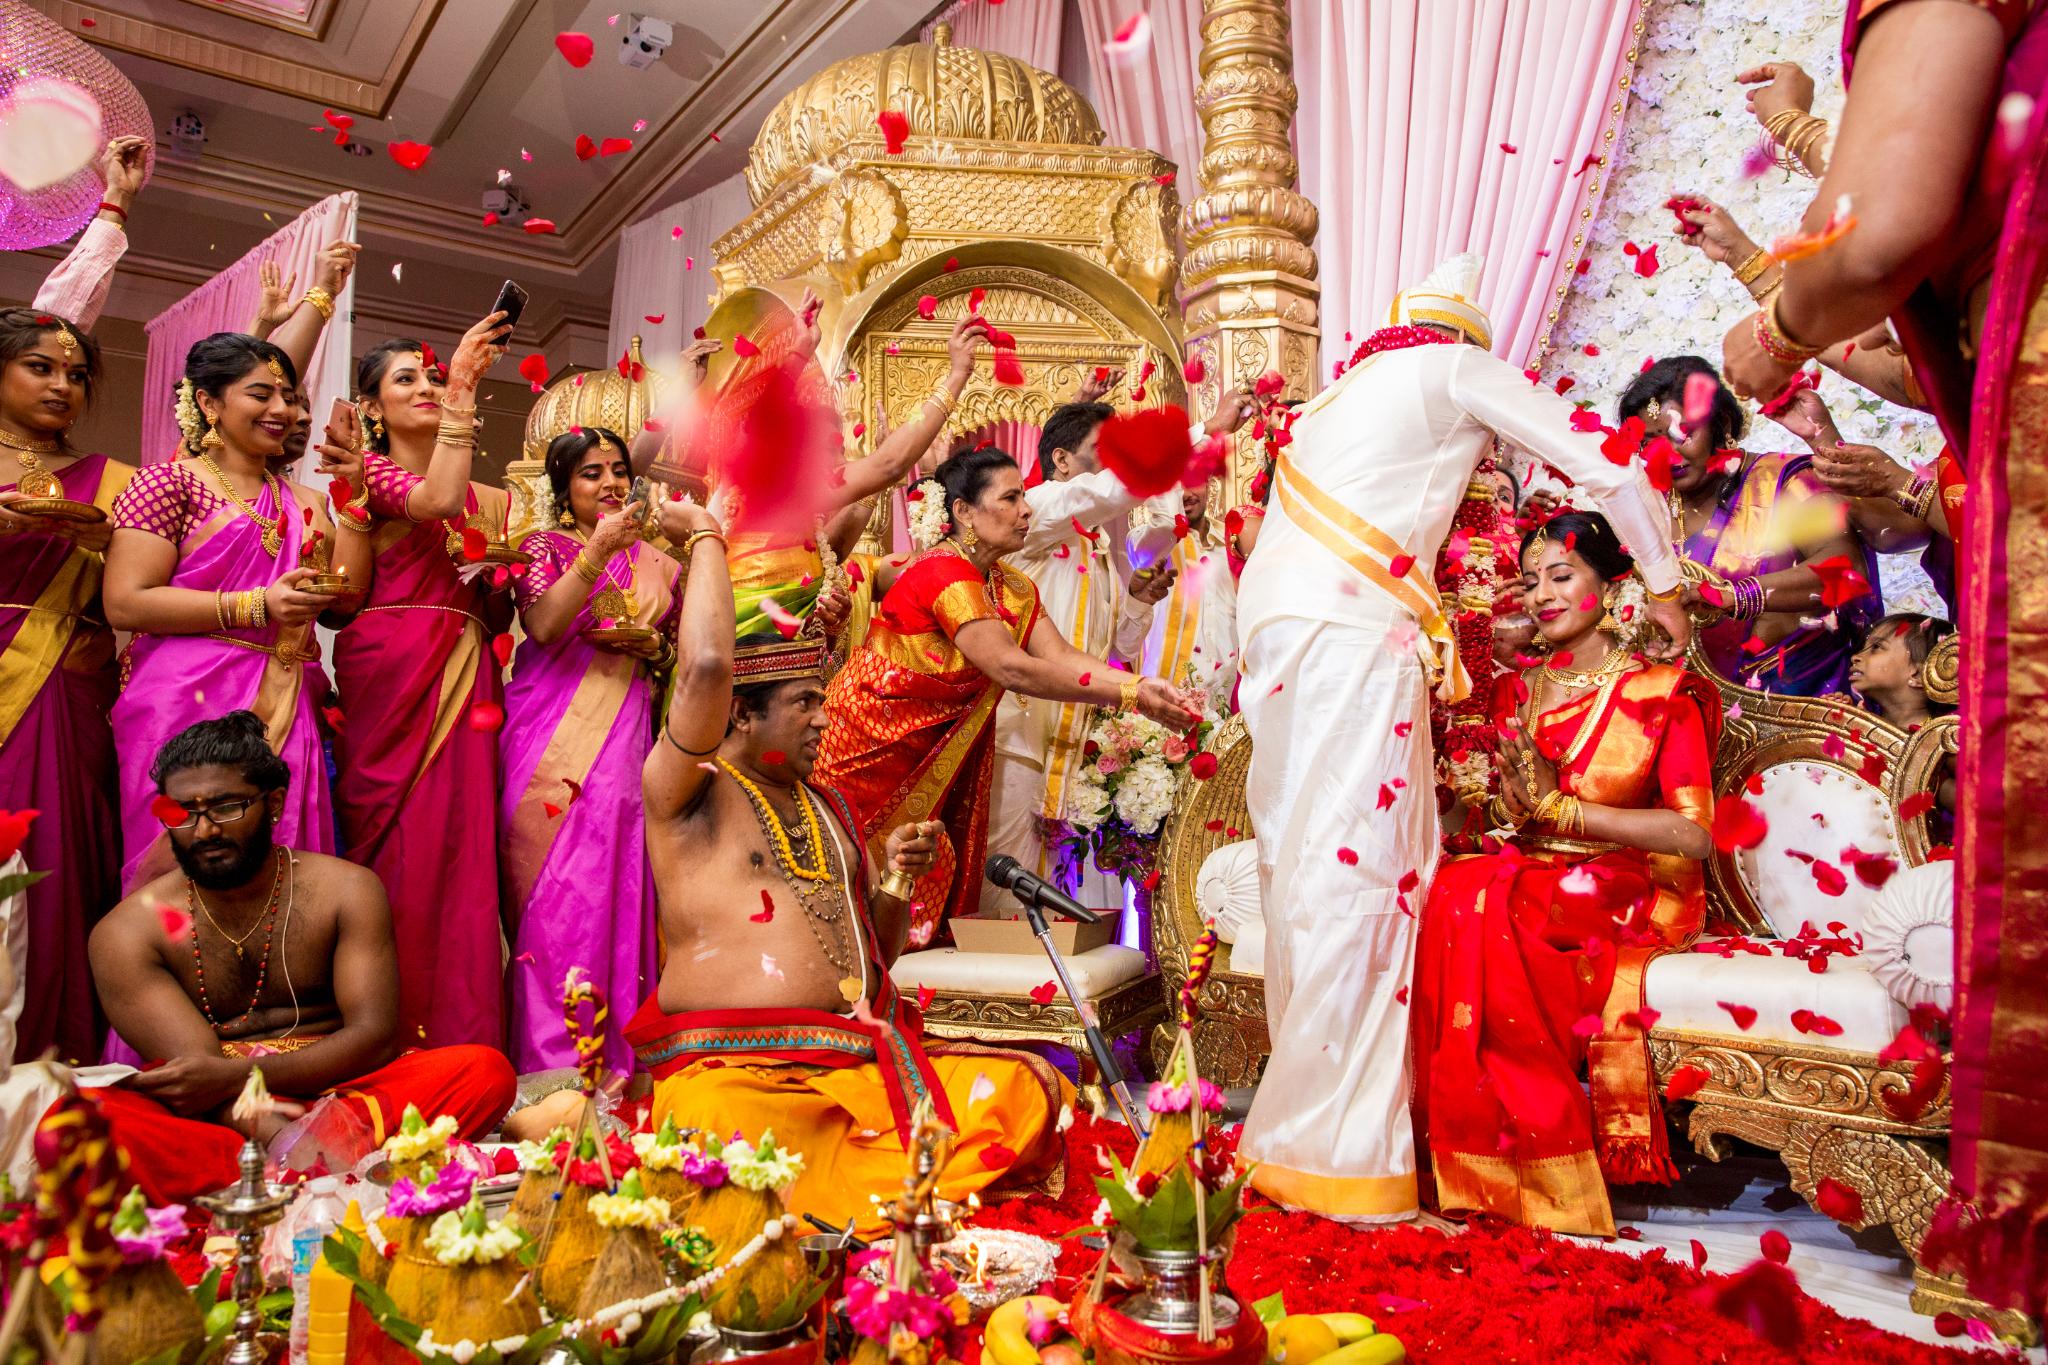 Thnuza & Sarmilan - Wedding & Reception - Edited (484).jpg